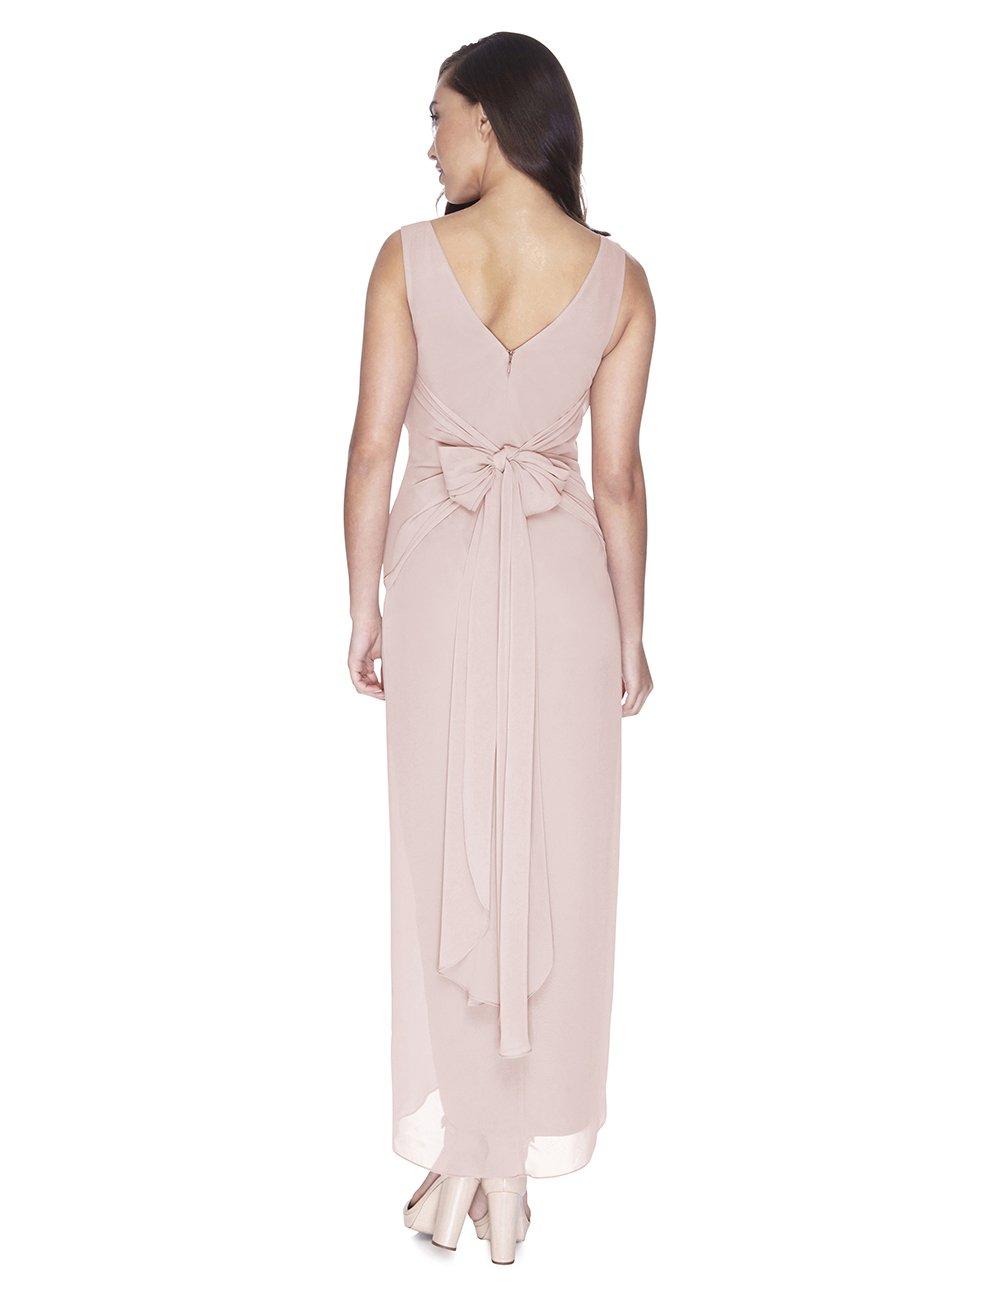 Try Before You Buy Bridesmaids Dress Ella in Tea Time